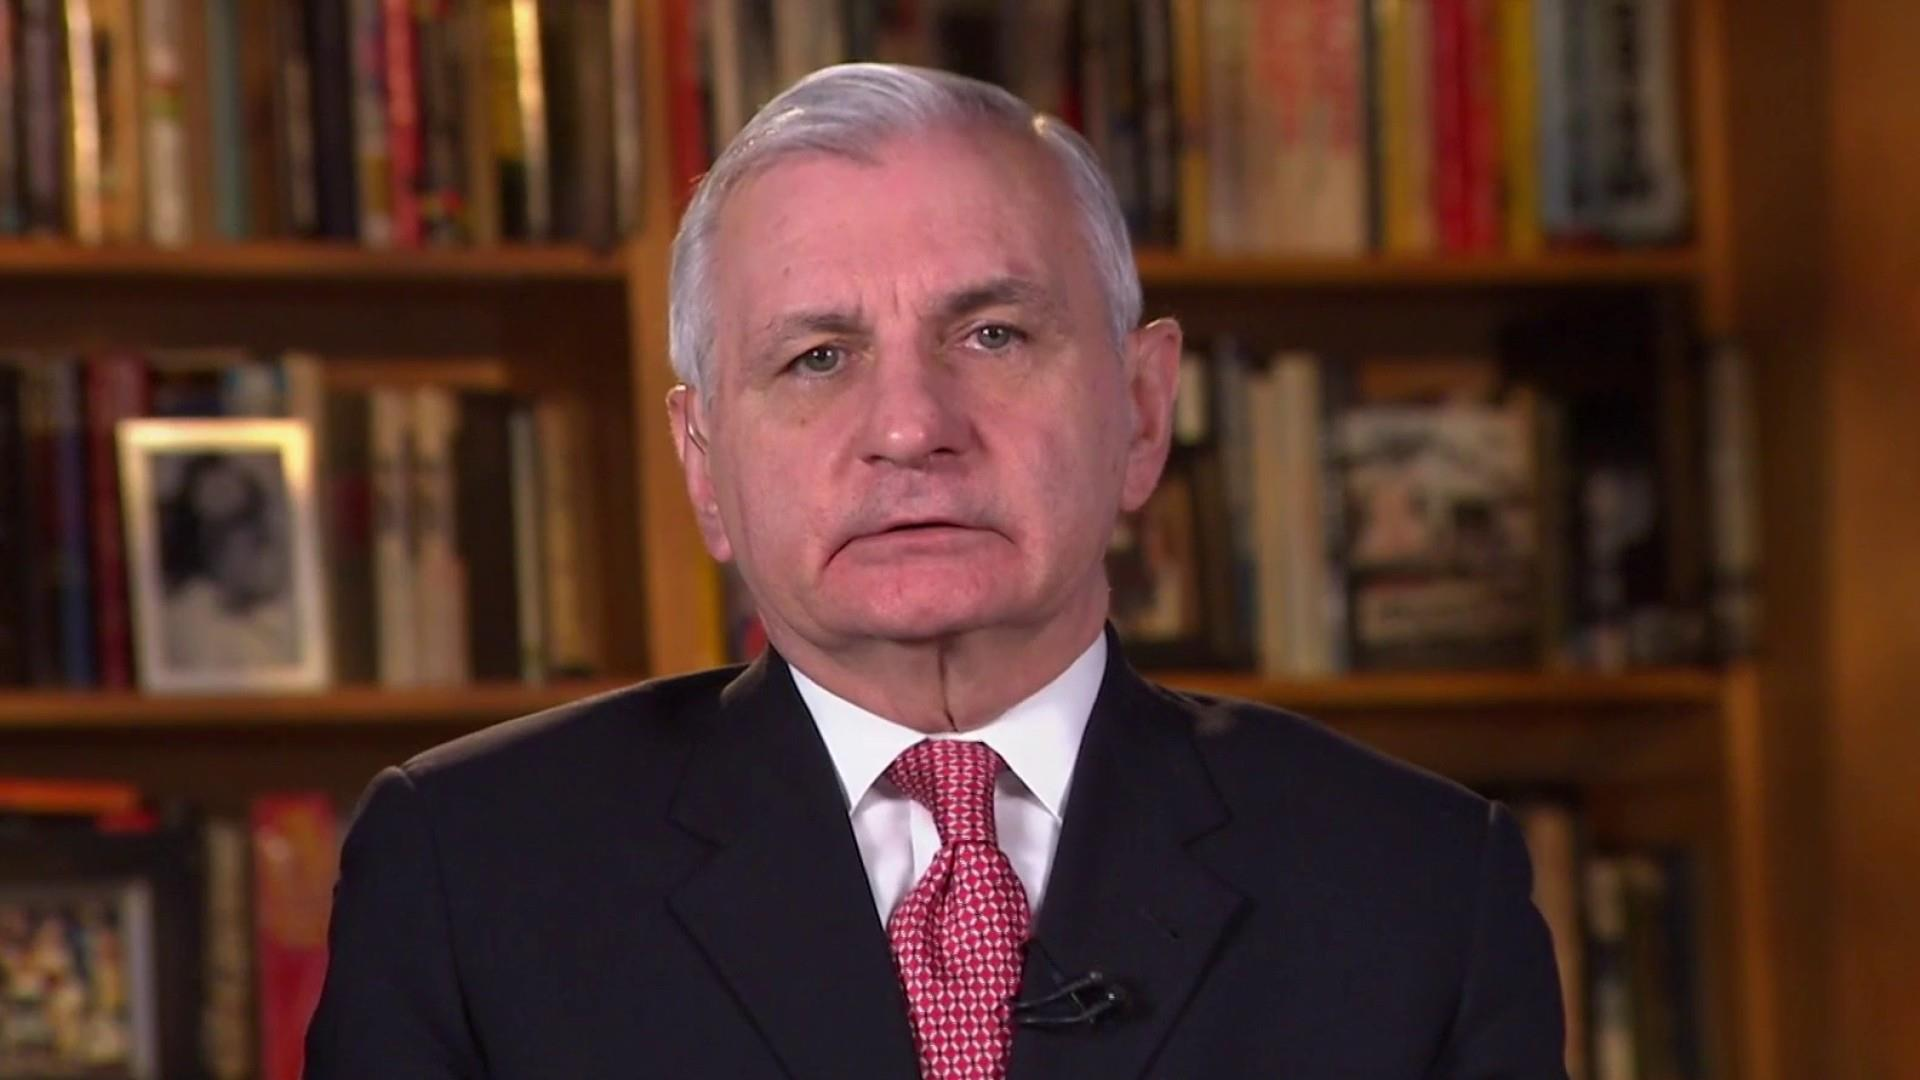 Sen. Jack Reed reacts to Trump's attacks against John McCain